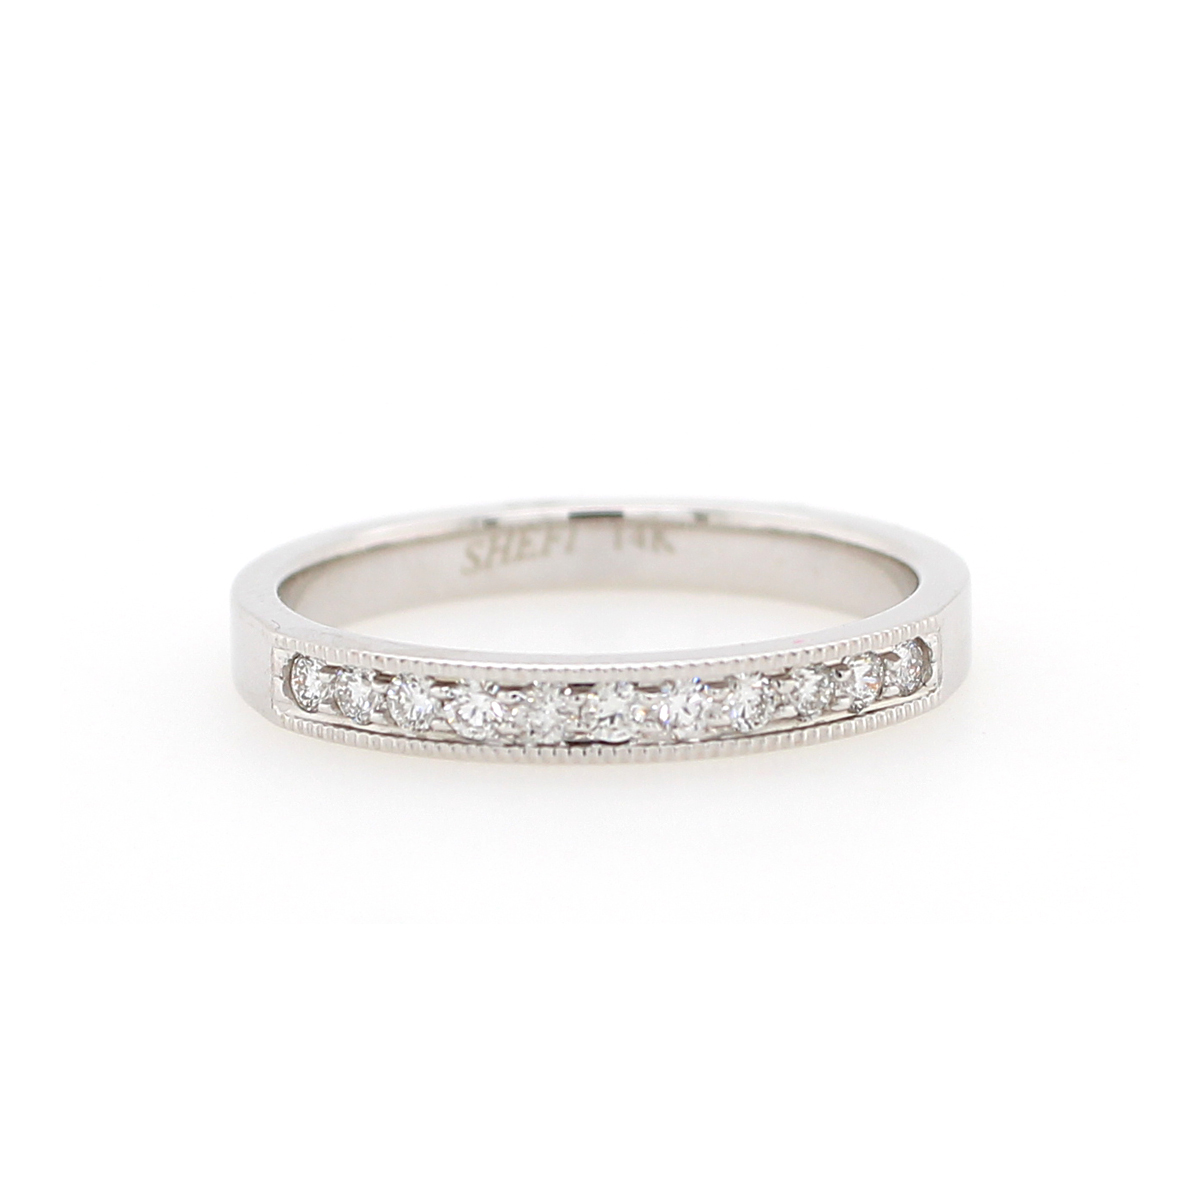 Shefi Diamonds 14 Karat White Gold .2 Carat Millgrain Edge Wedding Band